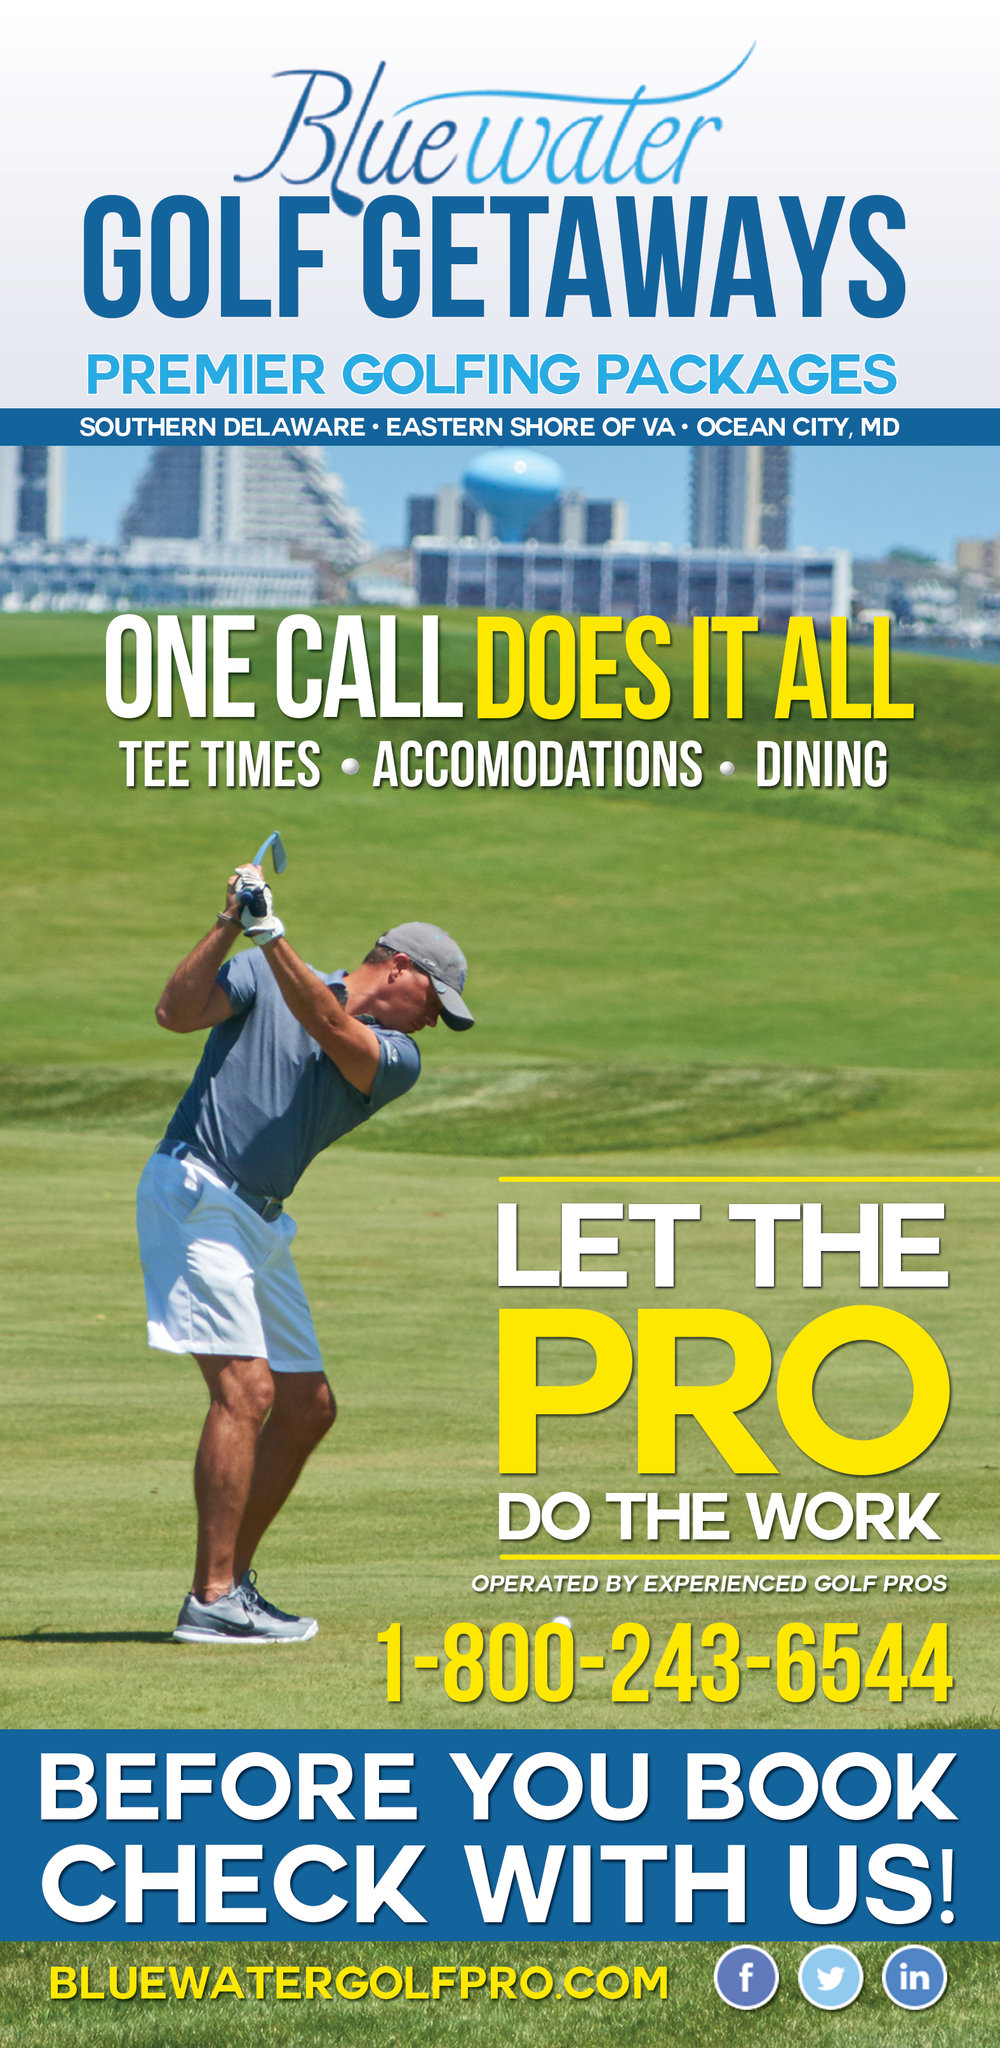 Golf-Getaway-Cover-4.jpg